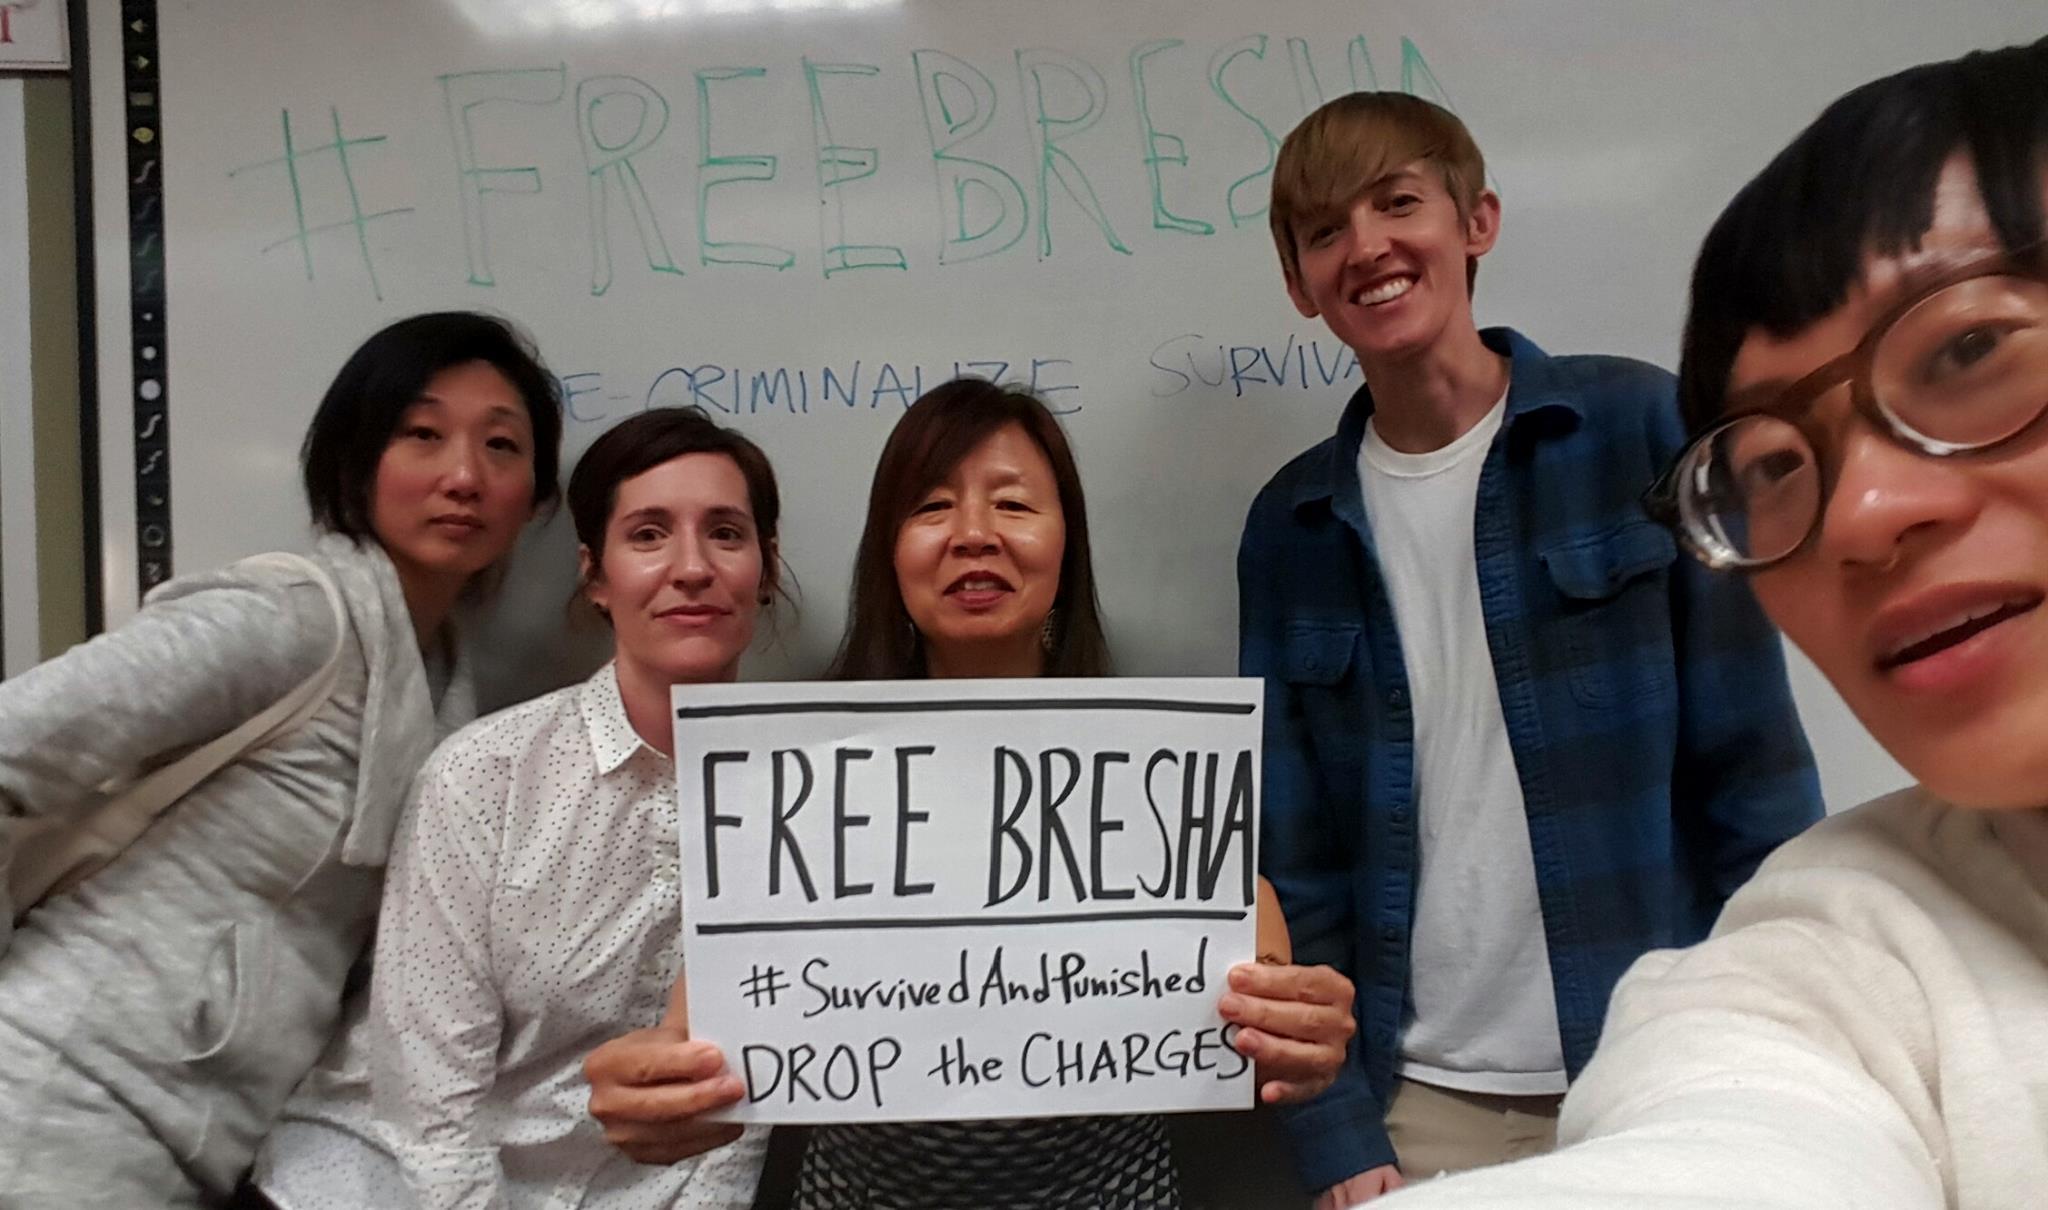 #FreeBresha #SurvivedAndPunished https://freebresha.wordpress.com/